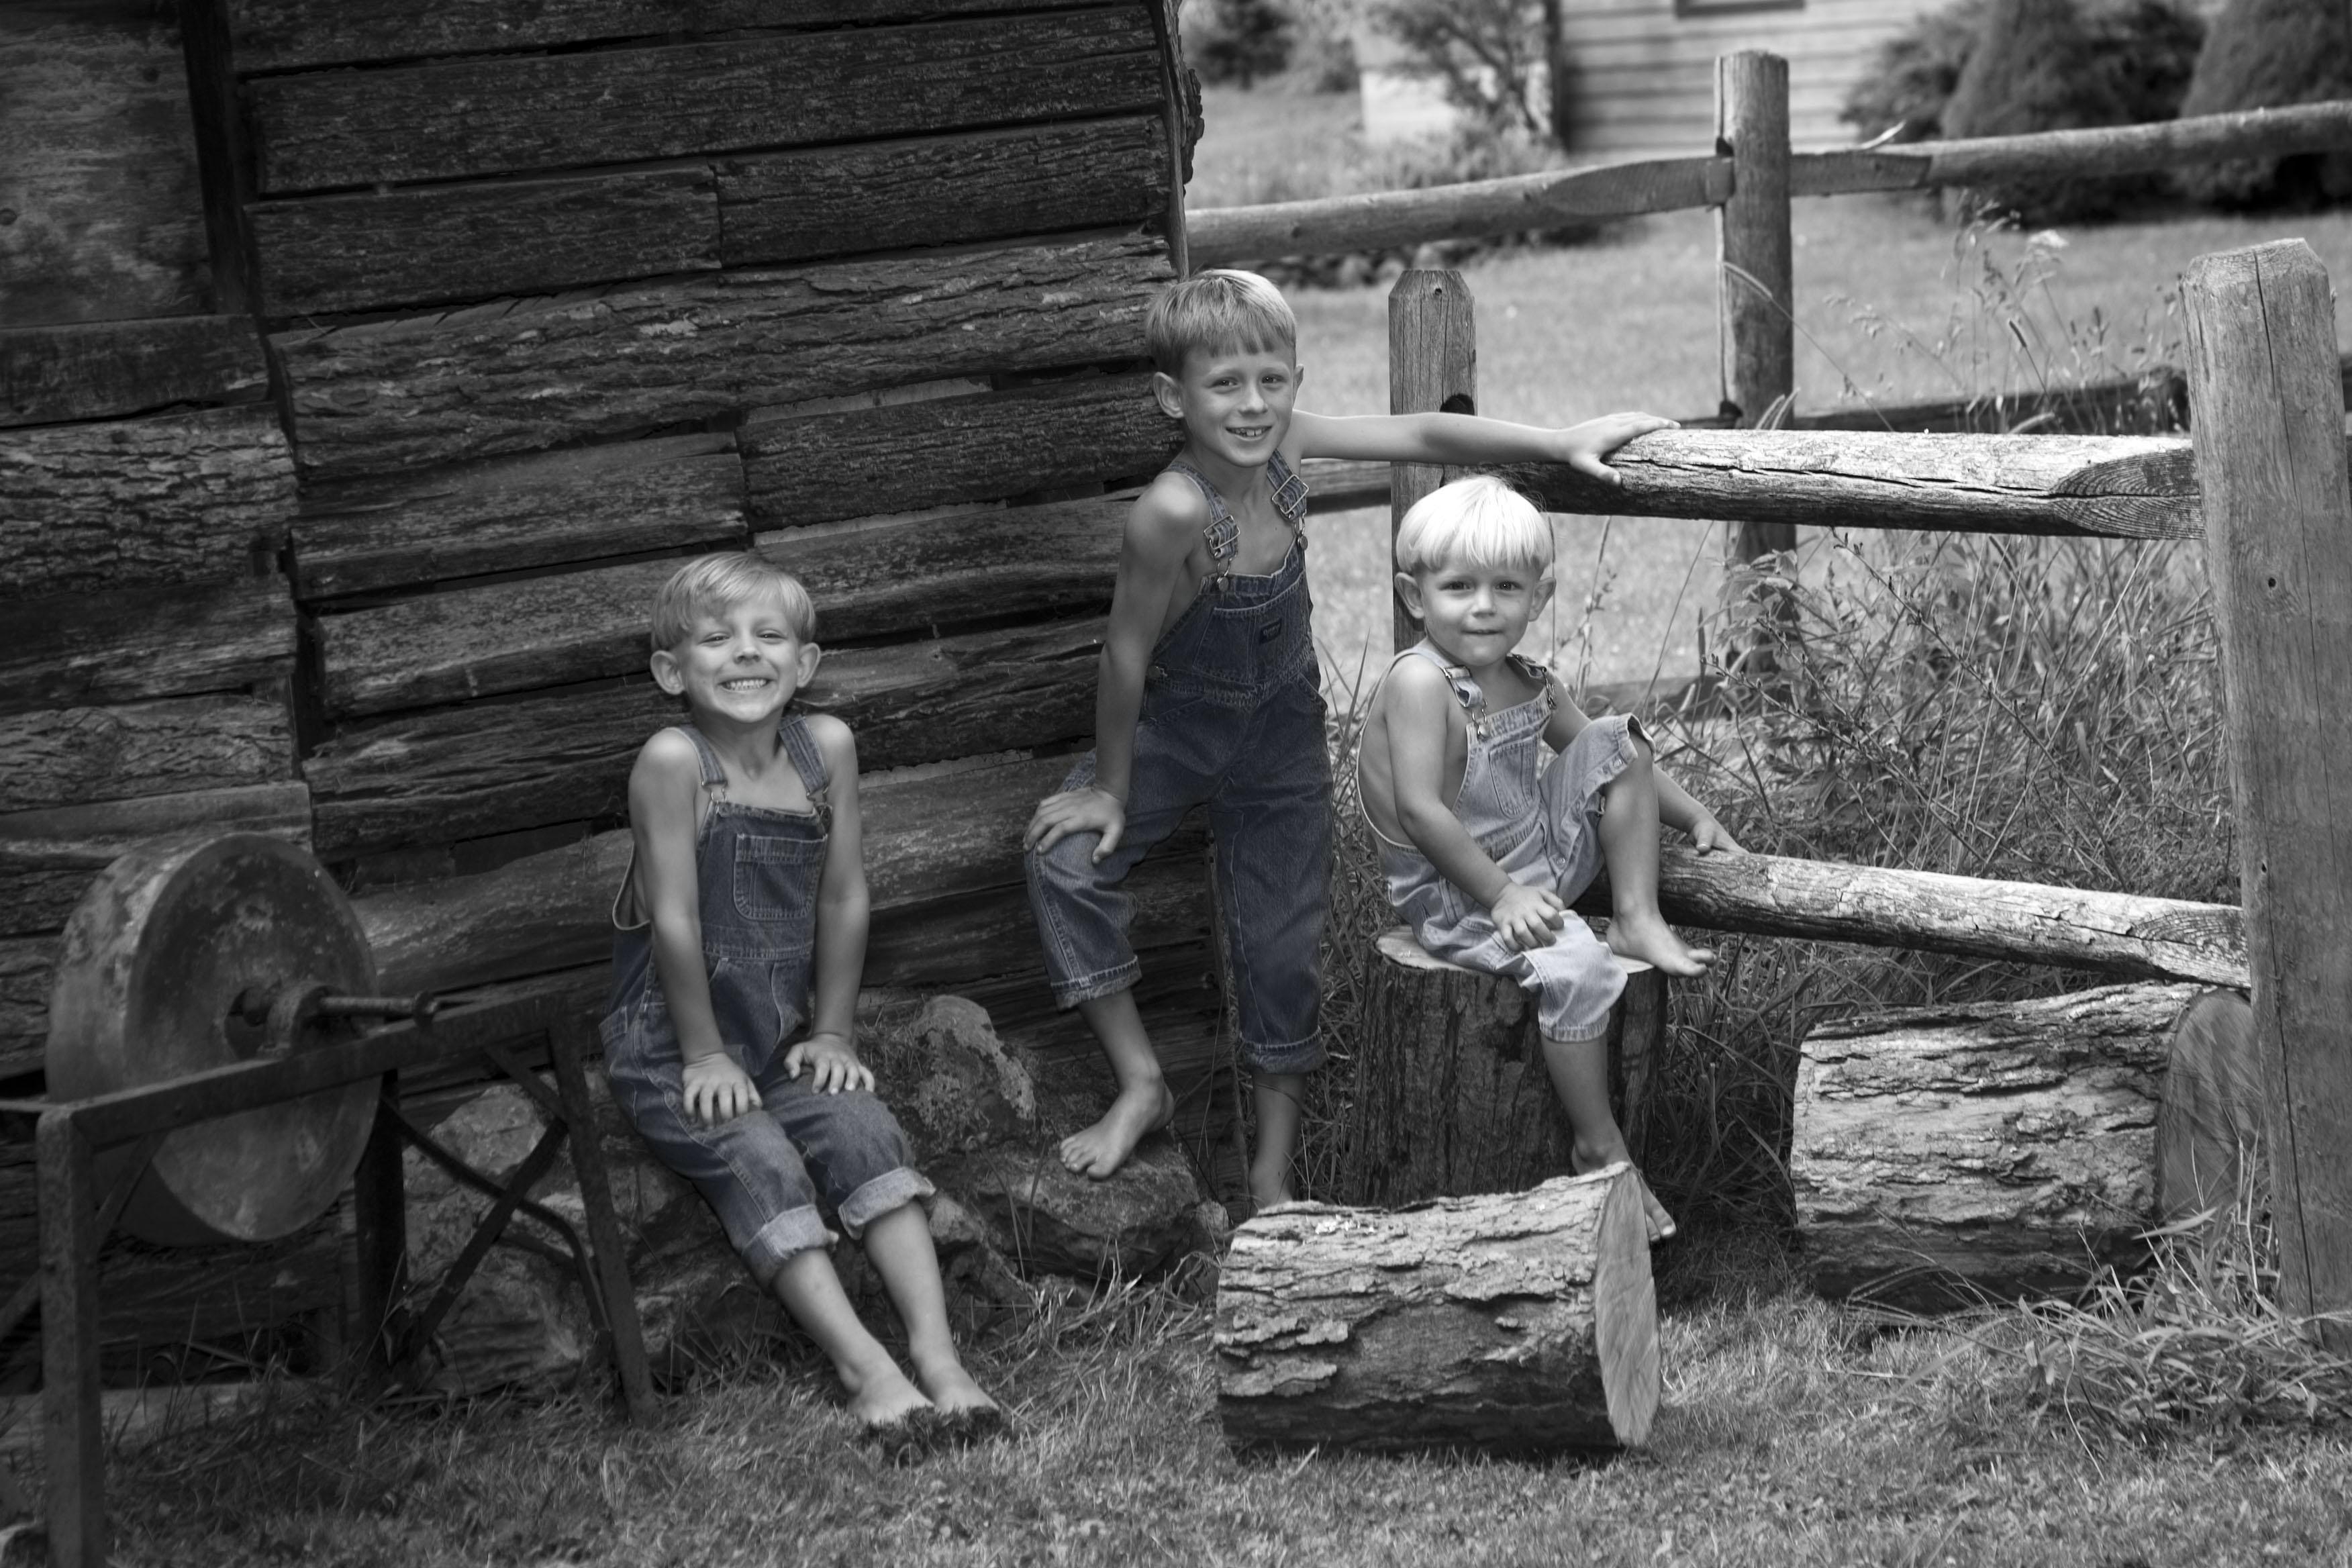 Children020.jpg